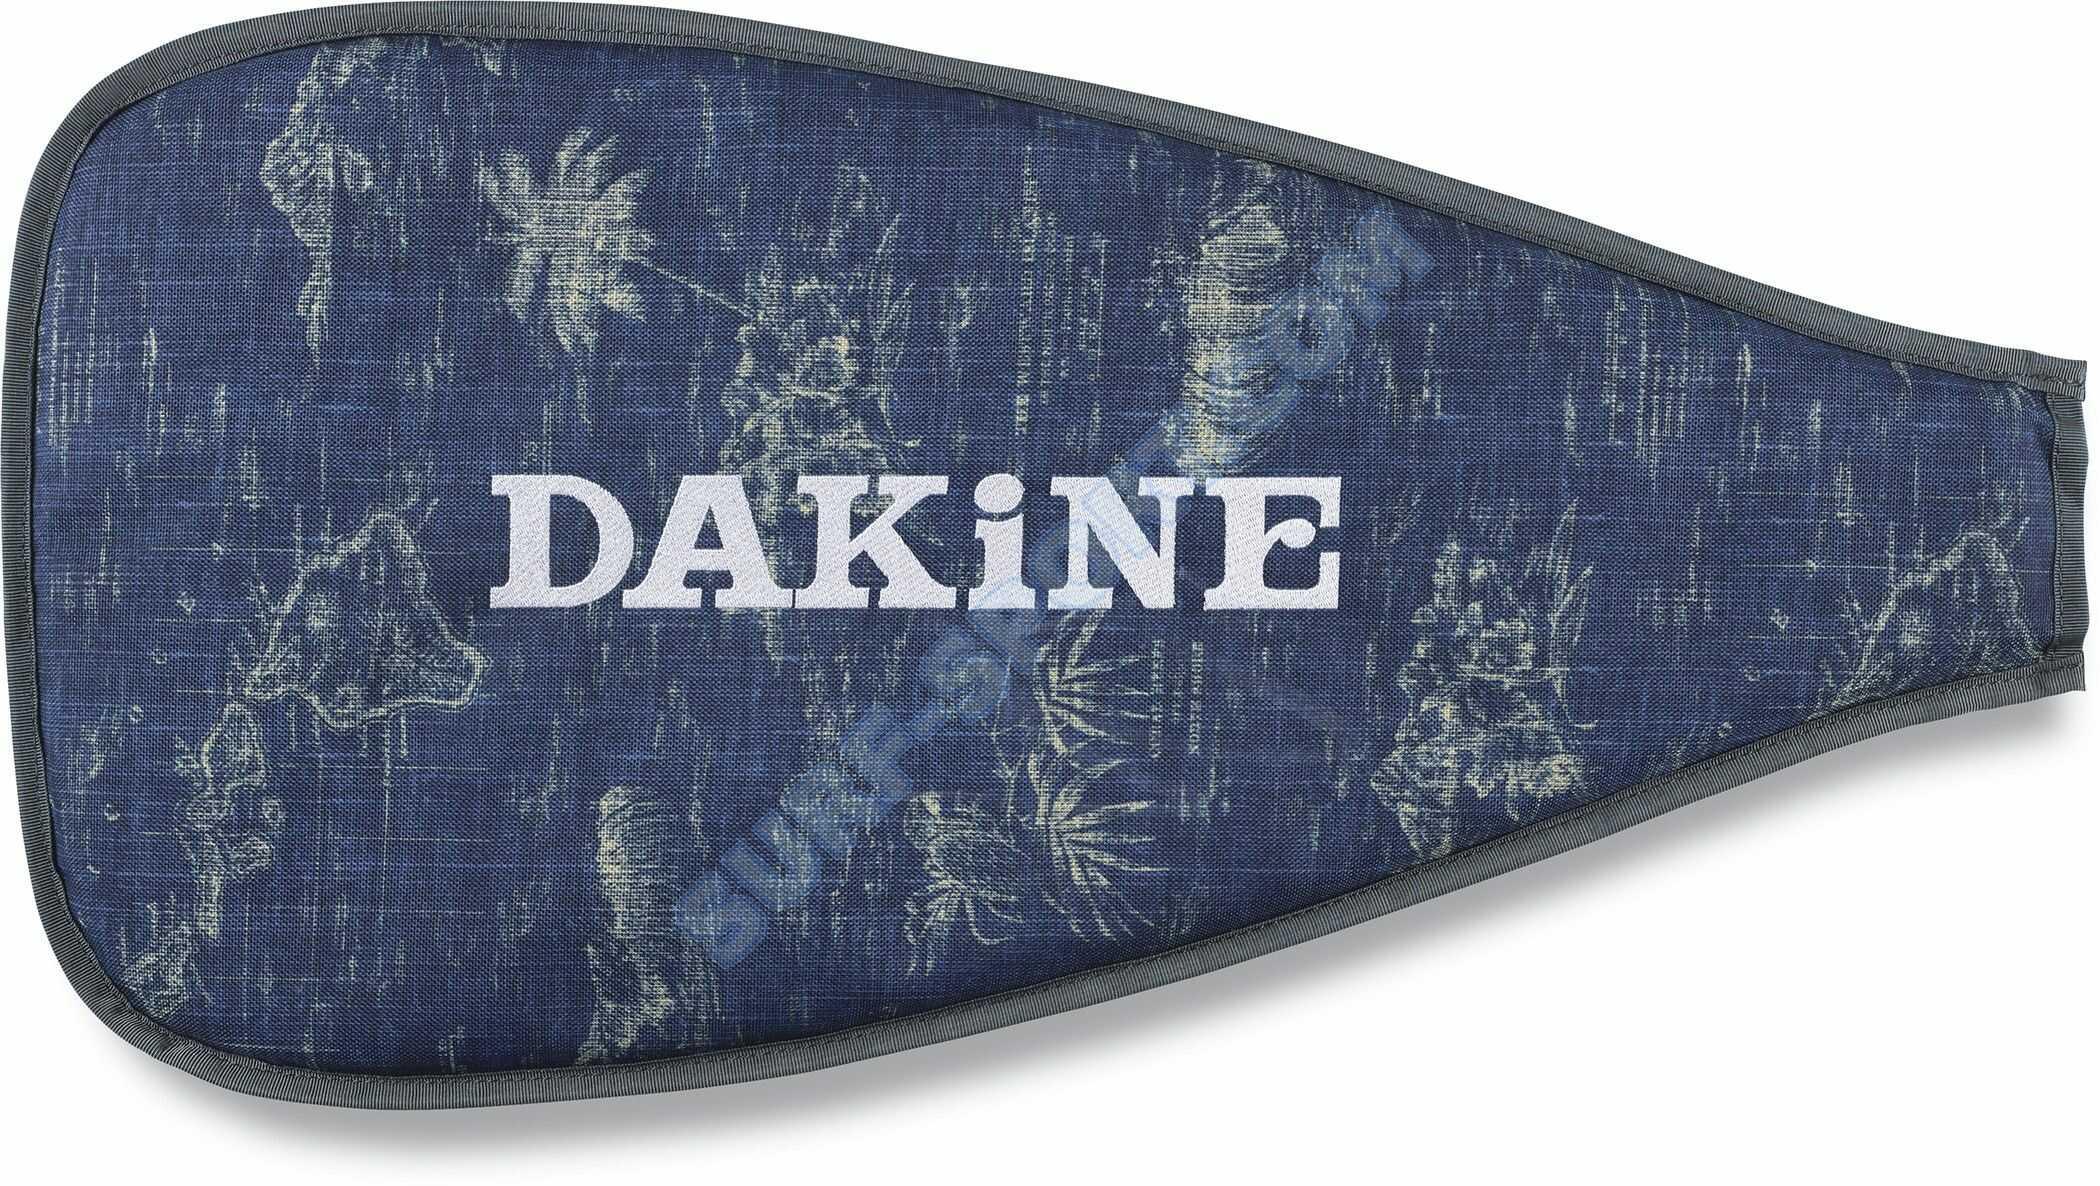 Pokrowiec Dakine Sup Blade Cover 2016 Duke